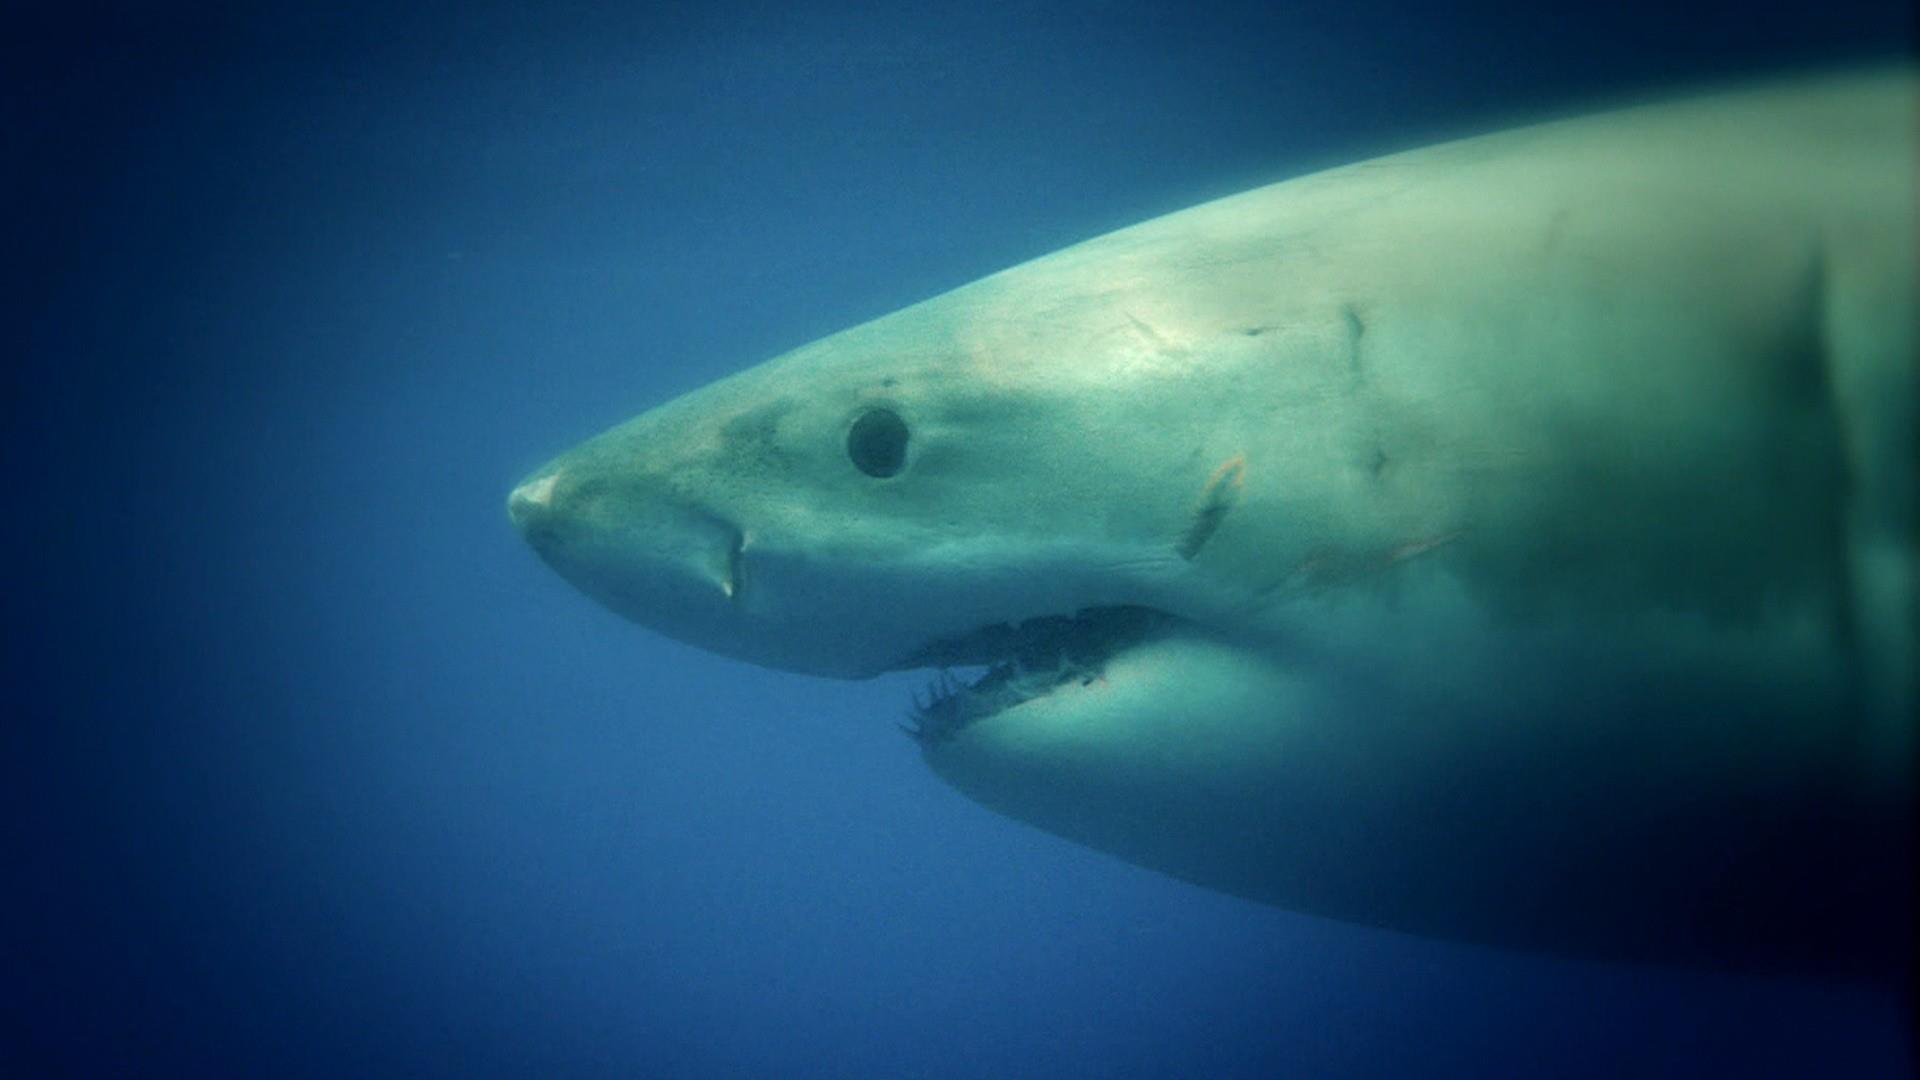 8-year-old attacked by shark off North Carolina coast